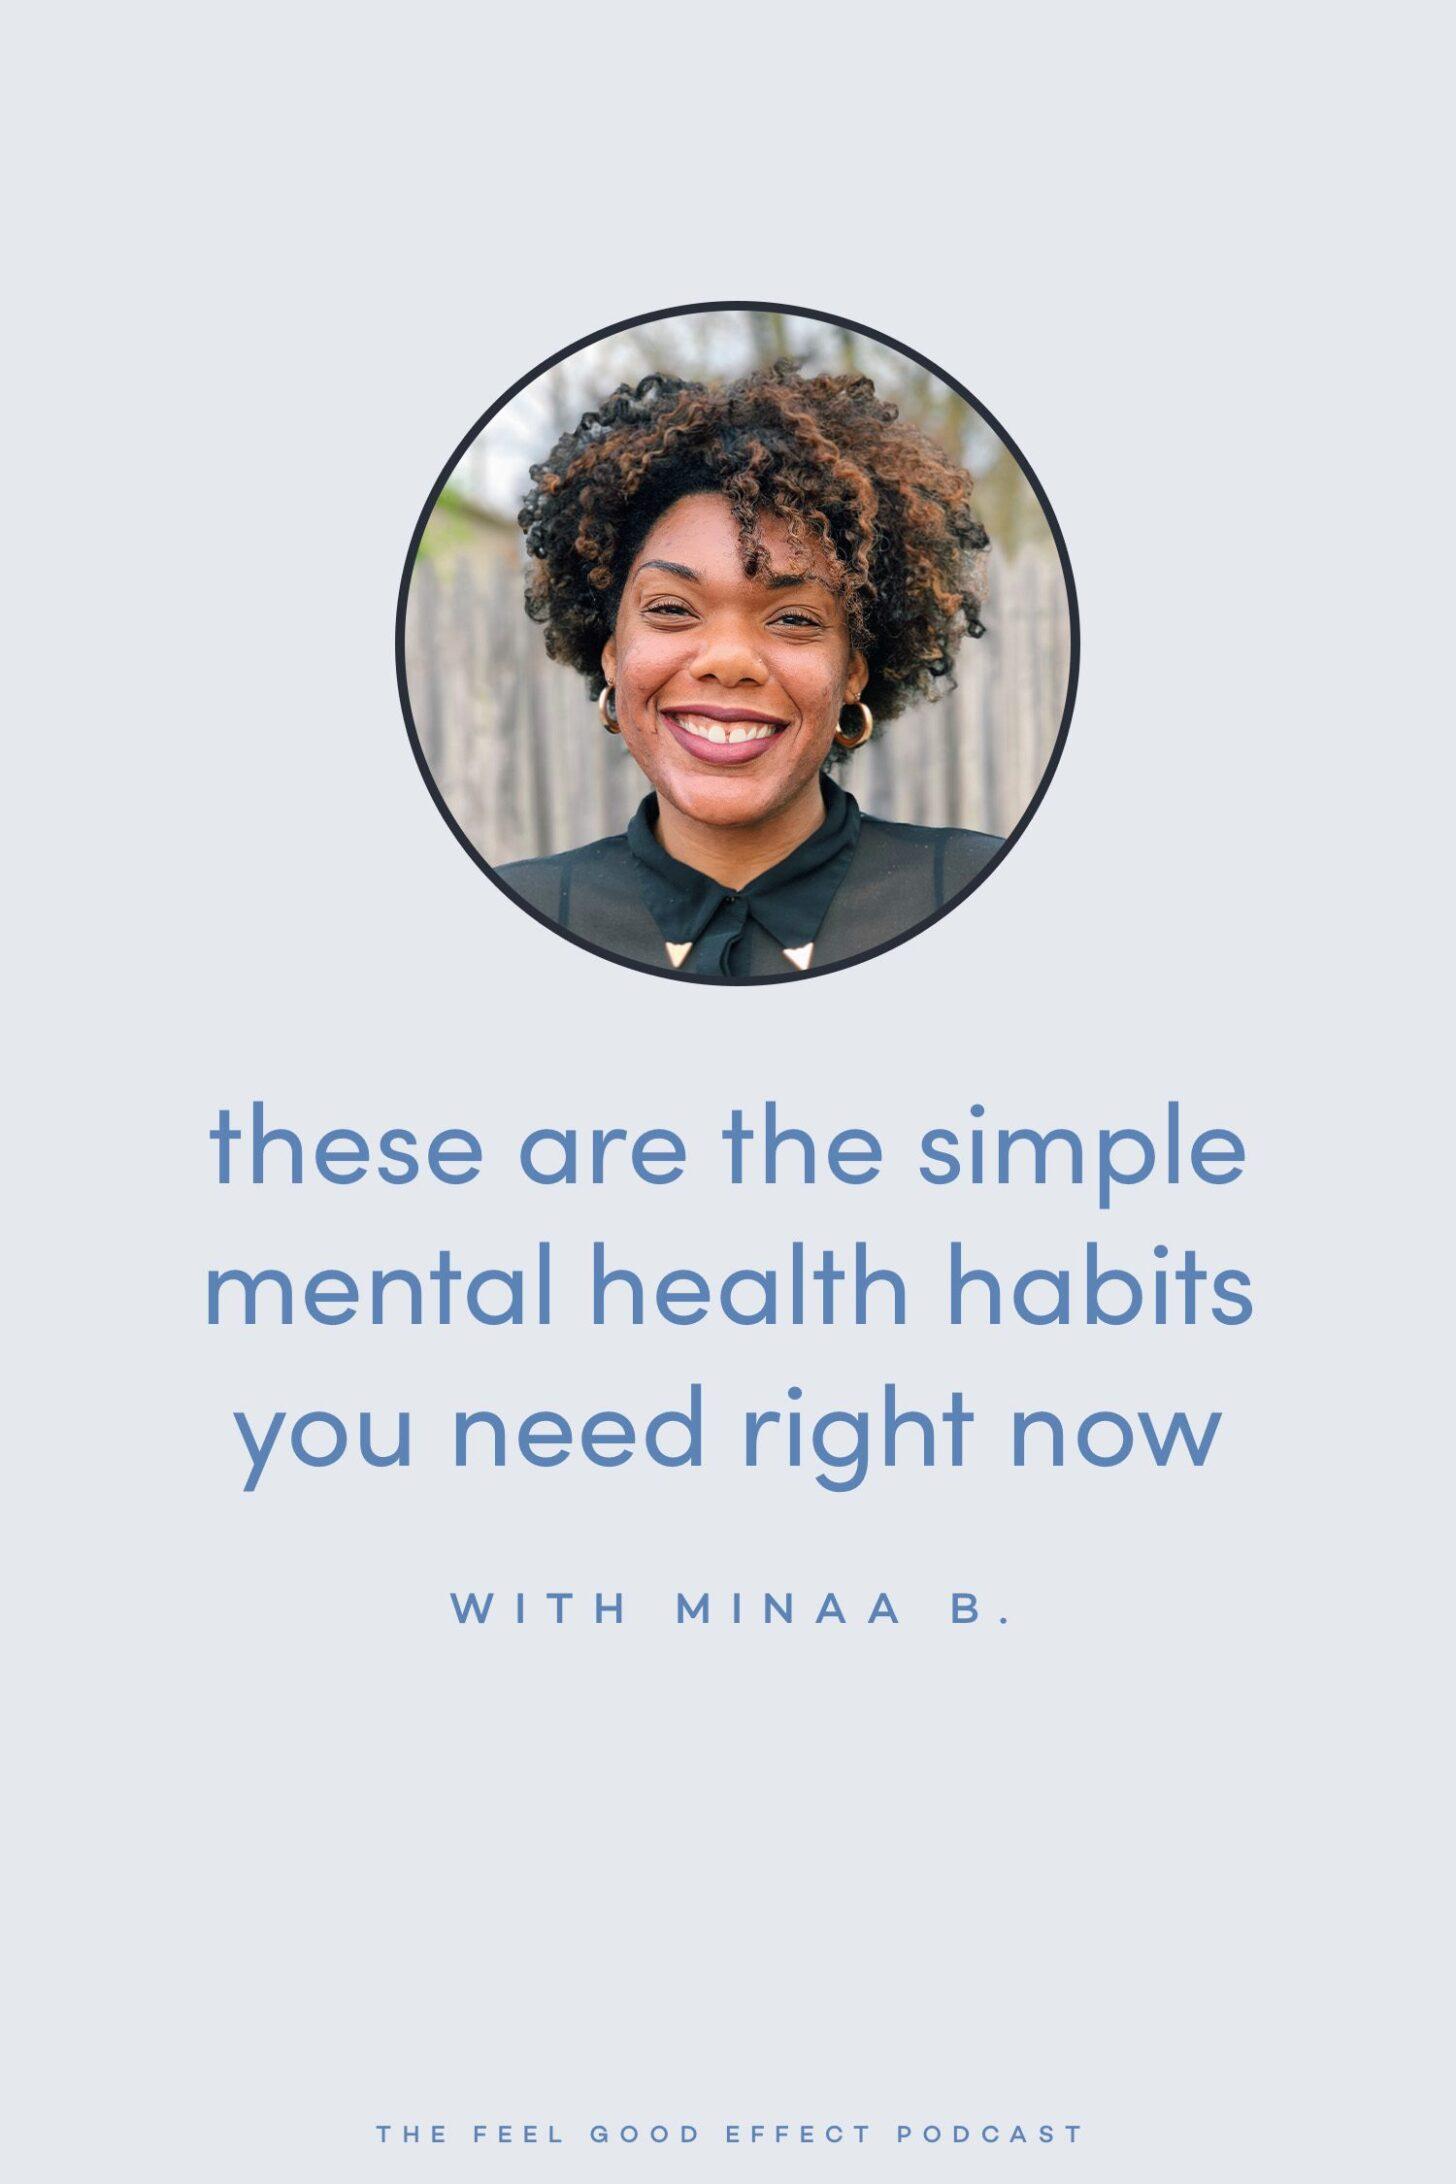 Simple-mental-health-habits-with-Minaa-B